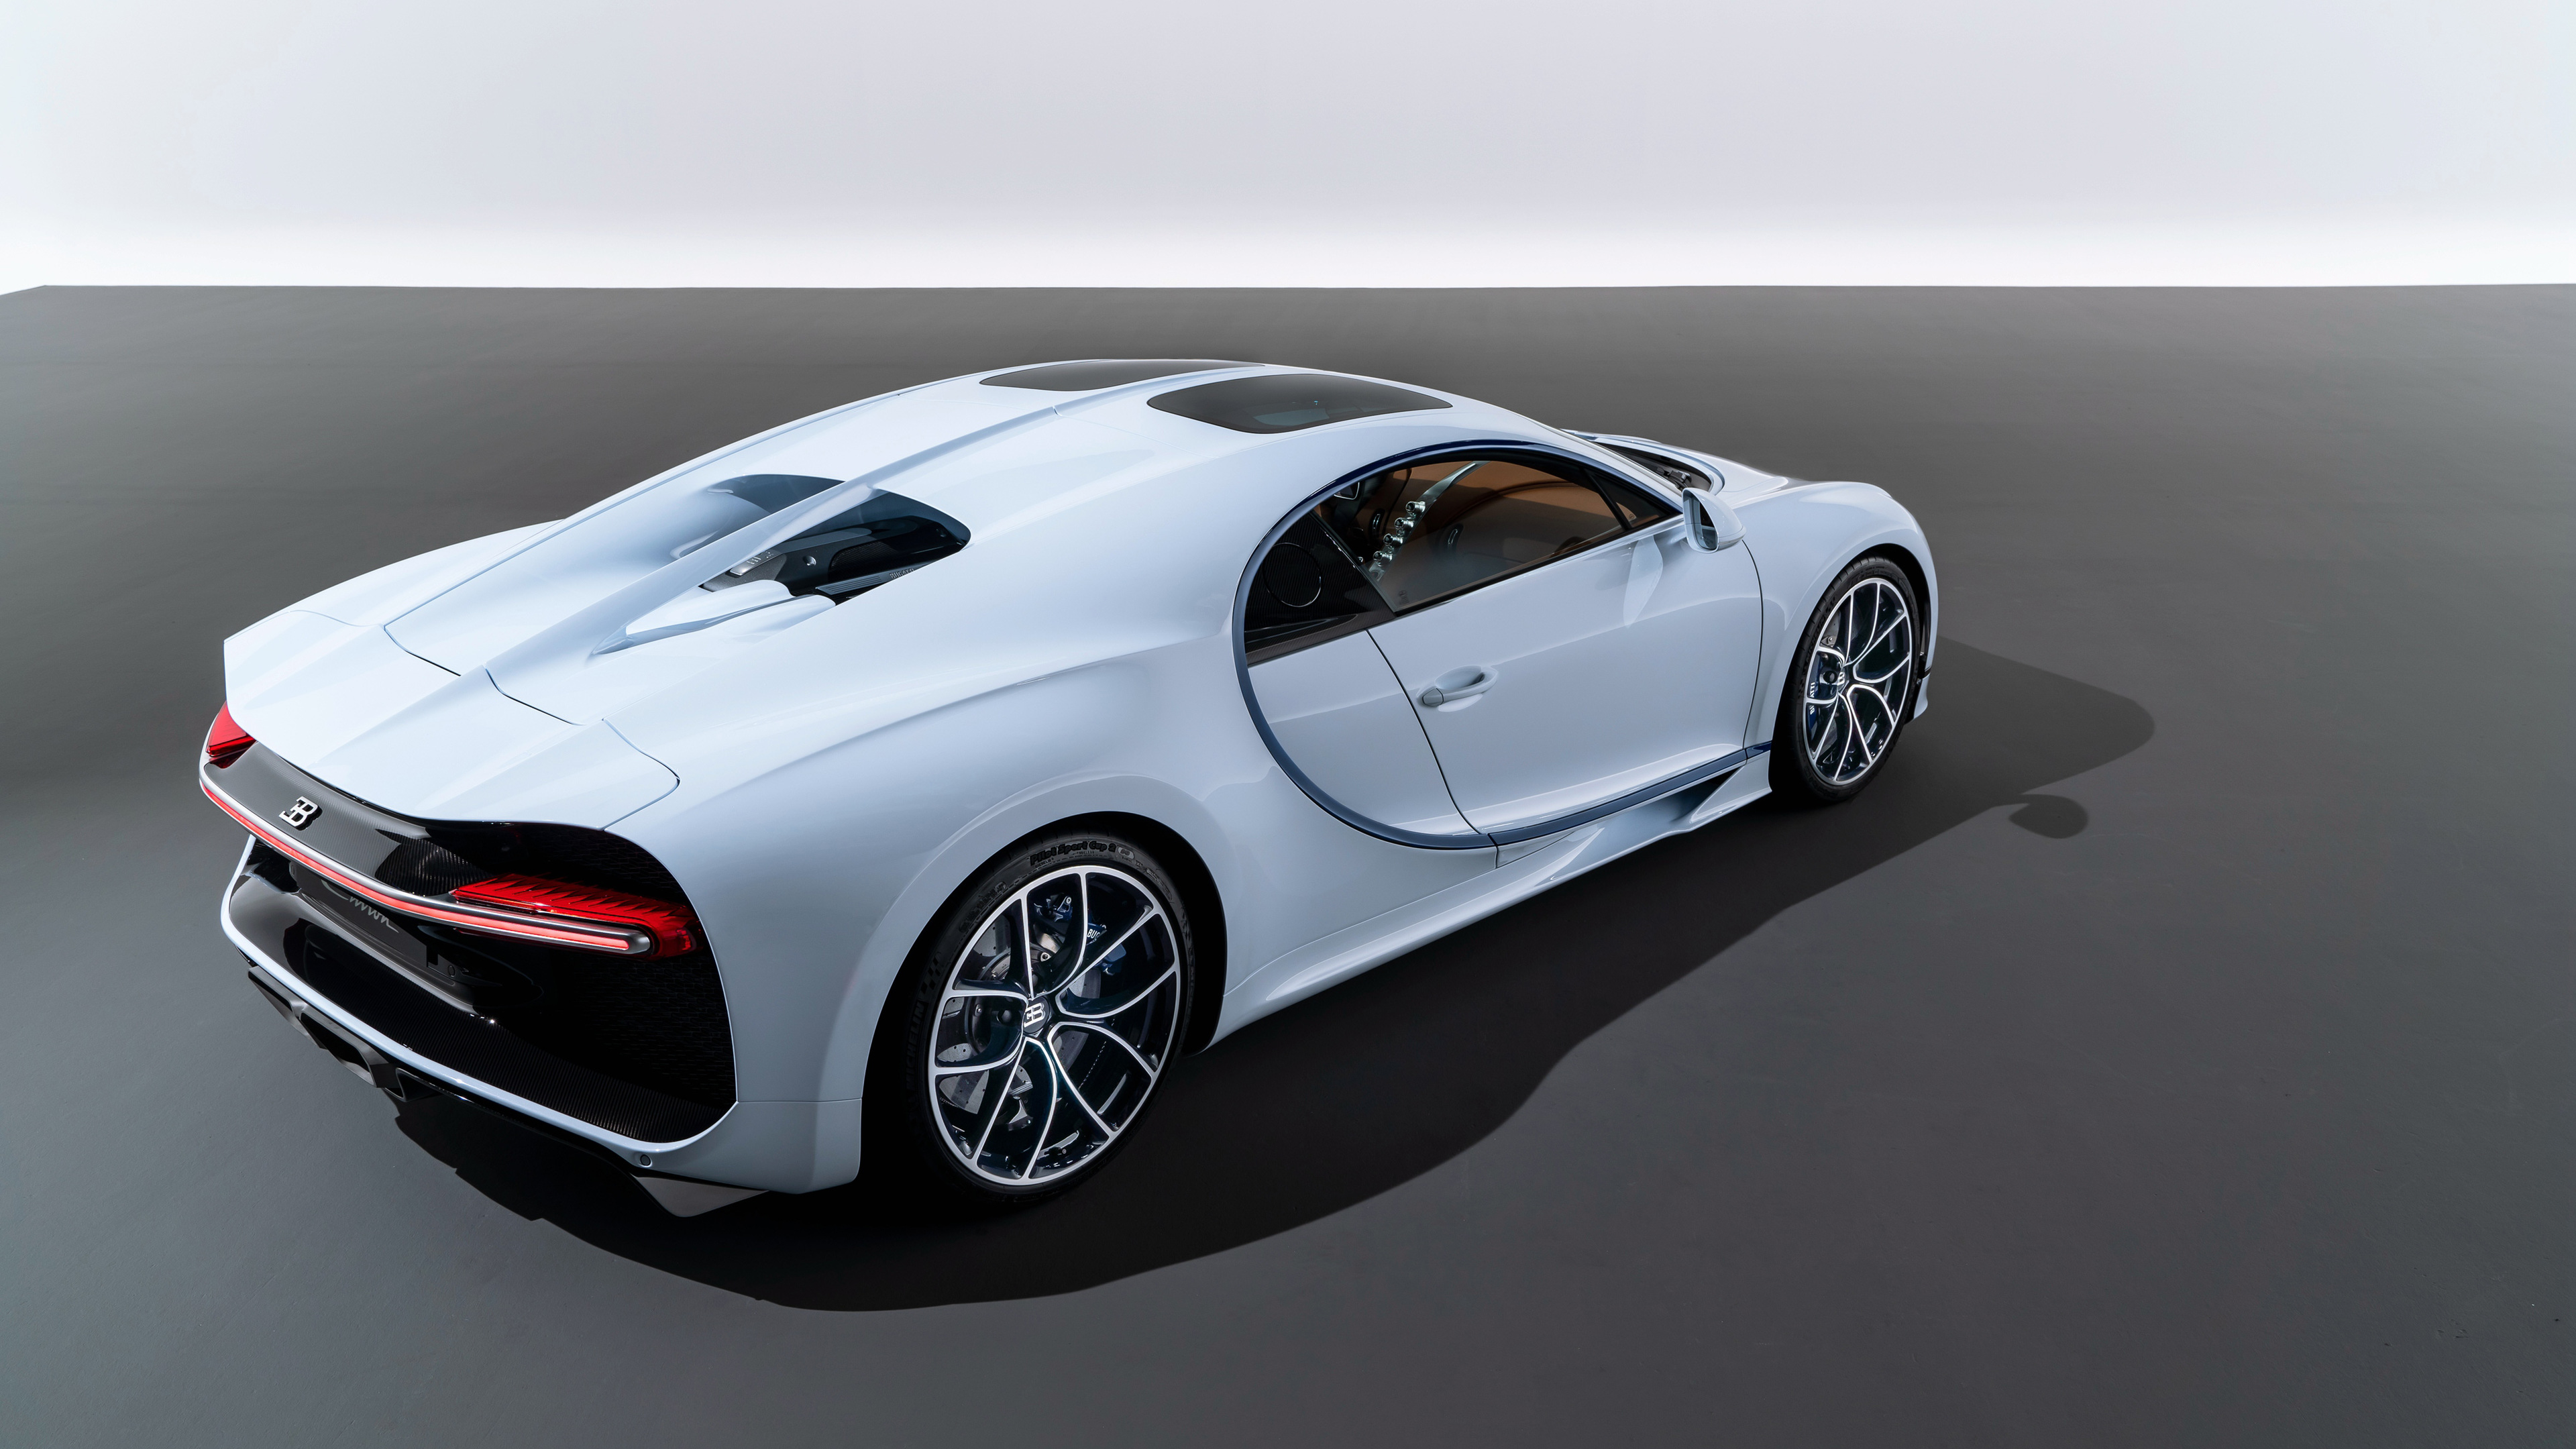 Wallpaper 4k 2018 Bugatti Chiron Sky View Rear 4k 2018 Cars